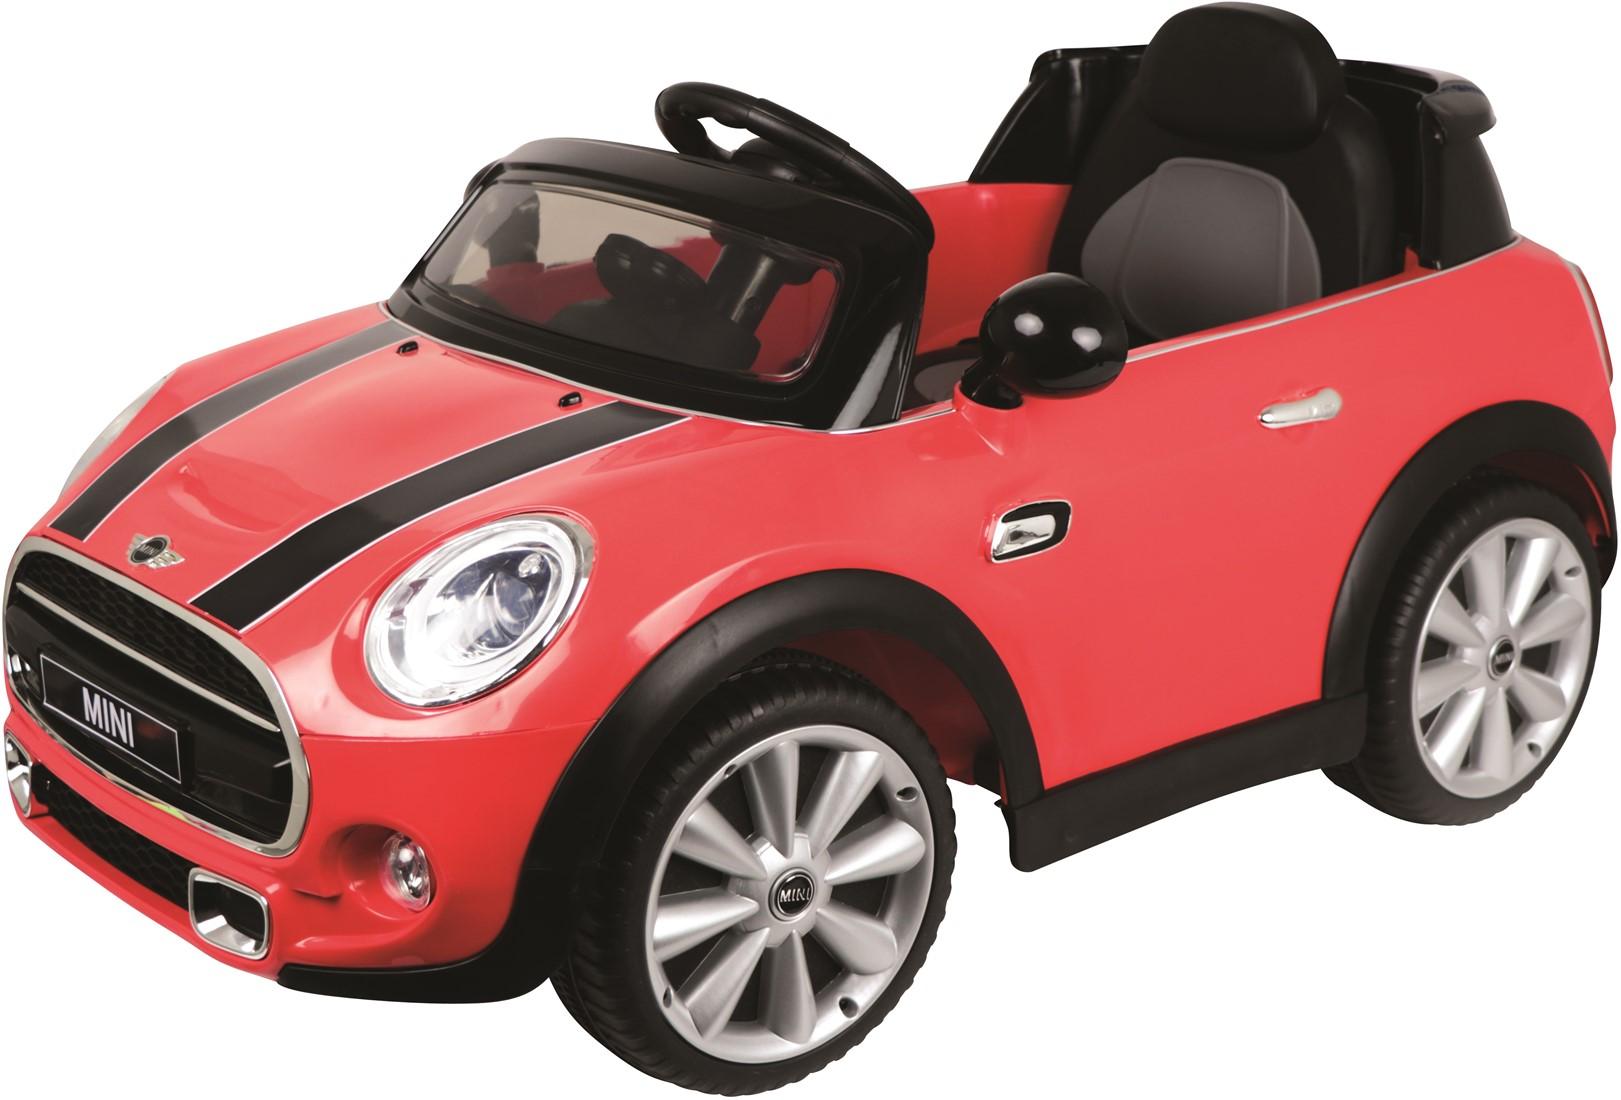 Afbeelding van E car mini cooper rood